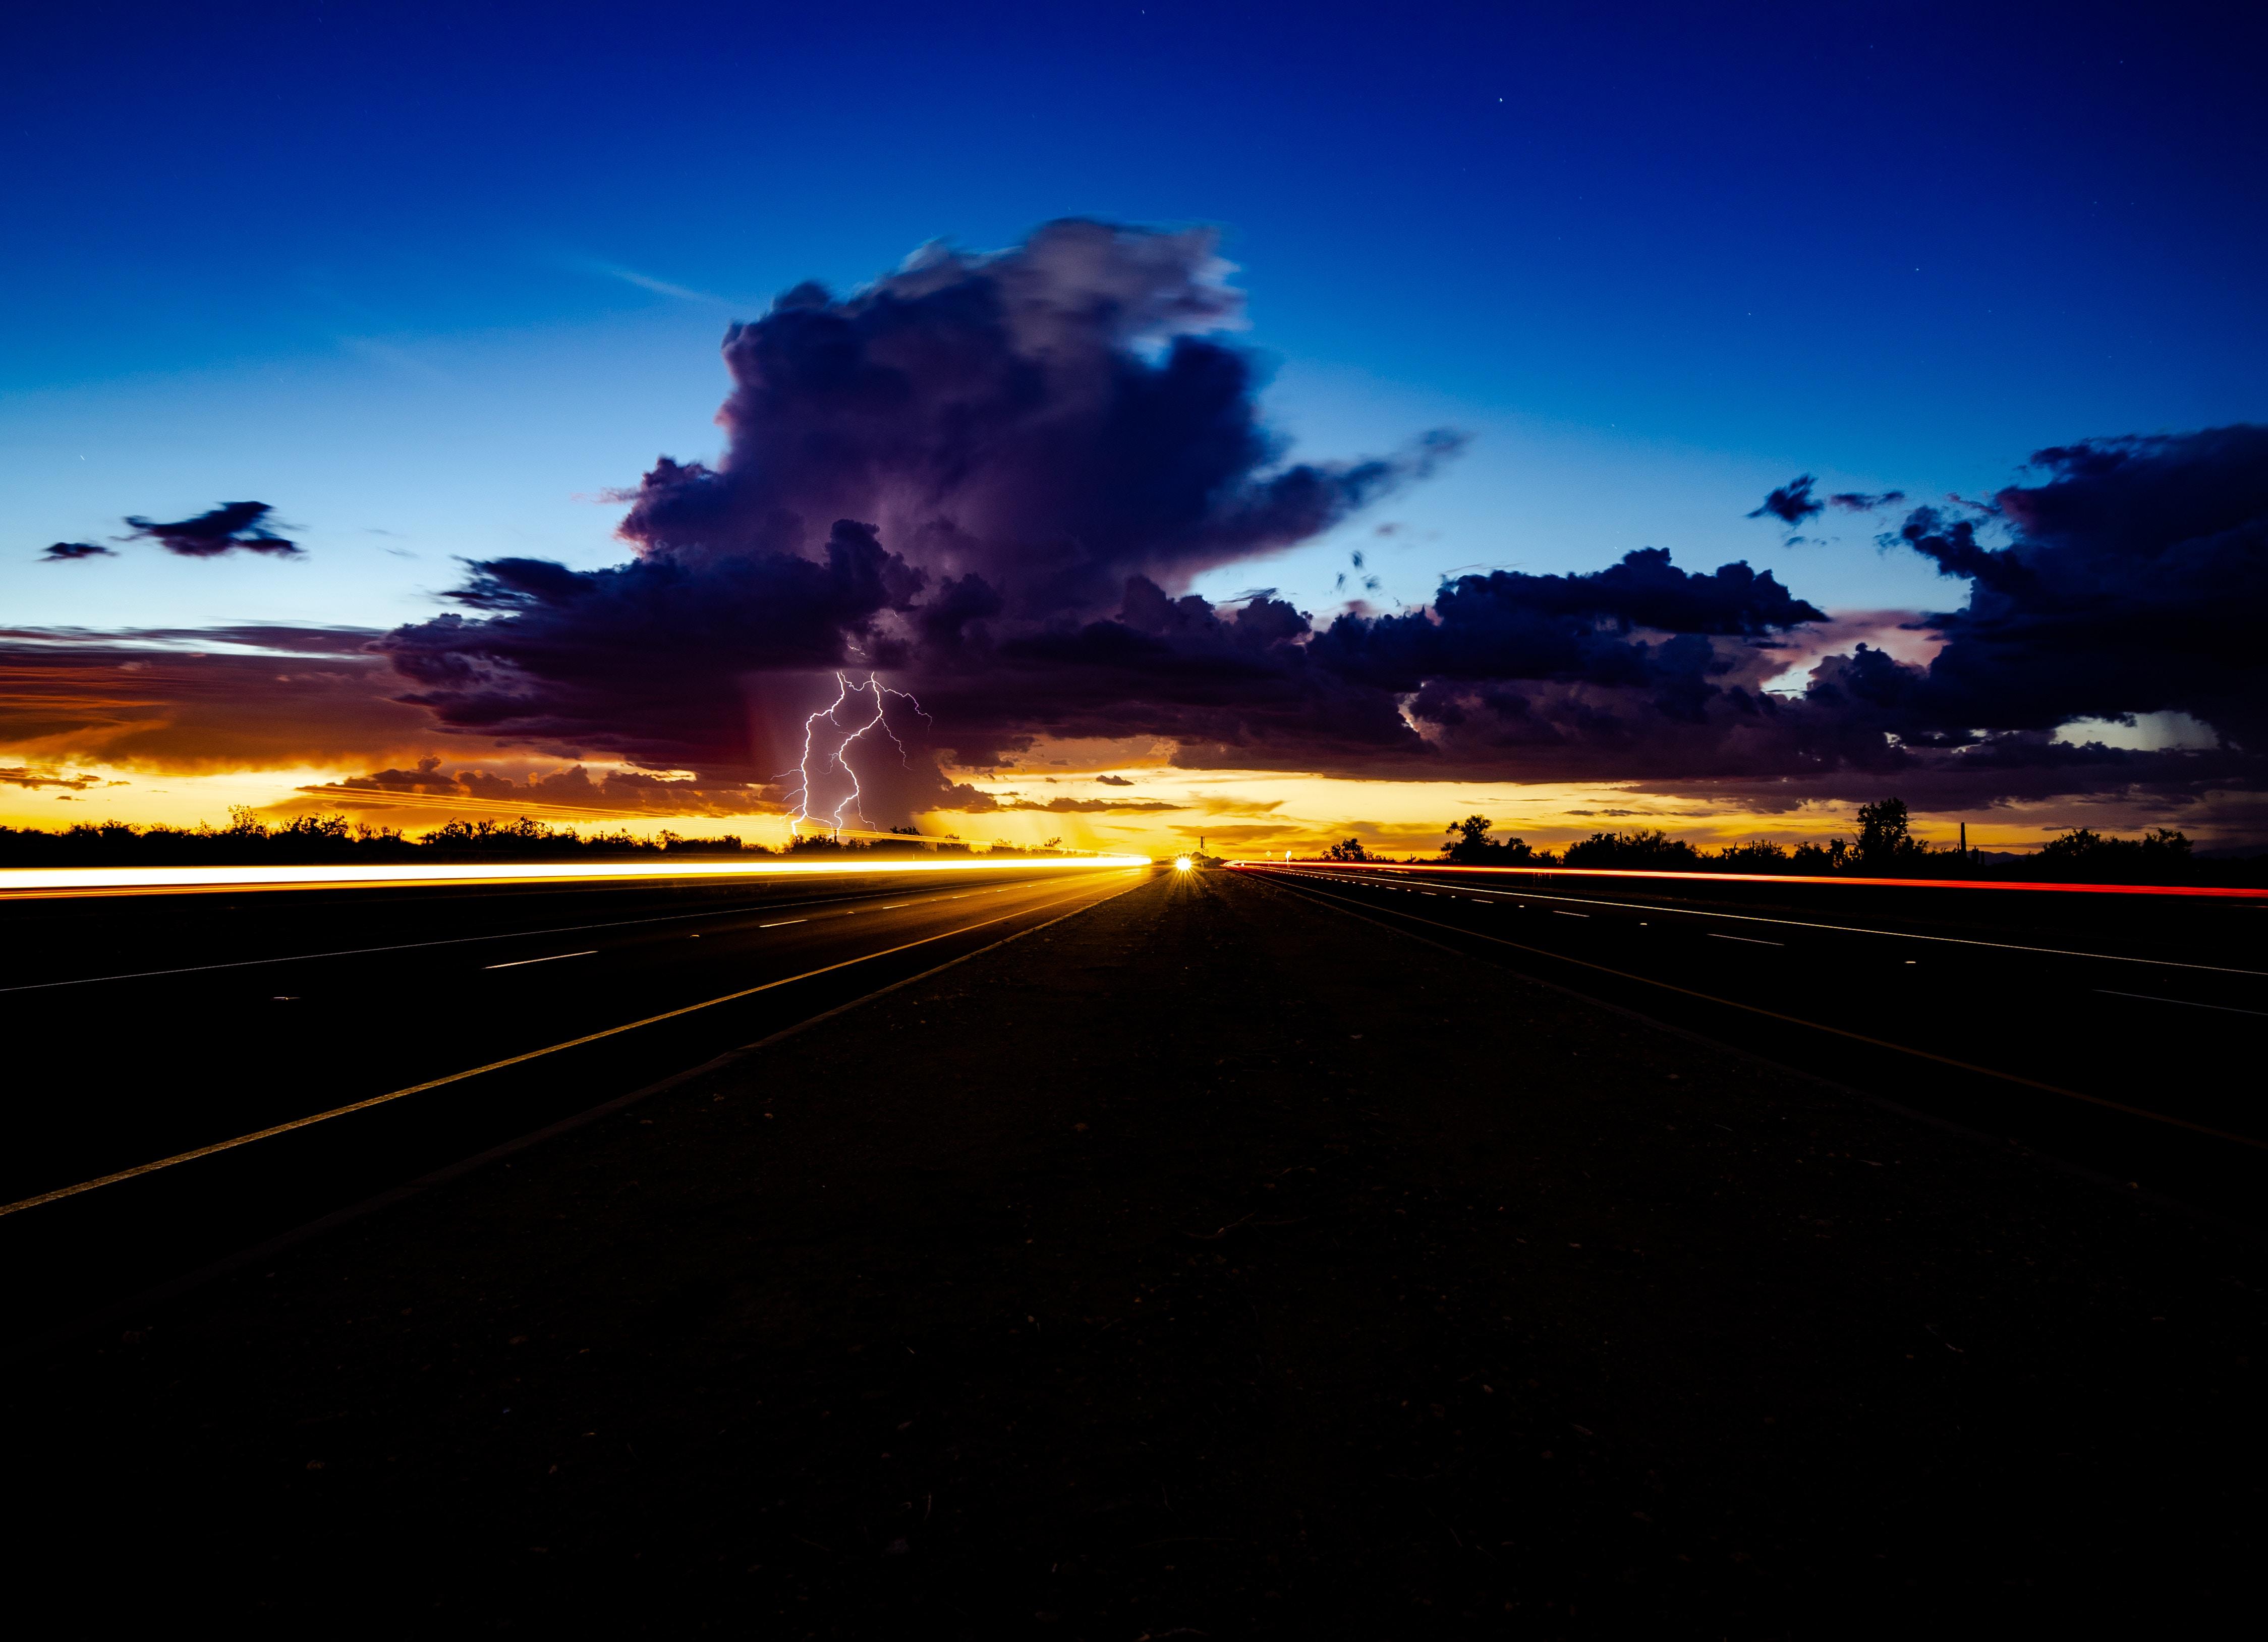 Thunder storm lightning highway light trails 5k hd nature 4k wallpapers images backgrounds - Lightning wallpaper 4k ...